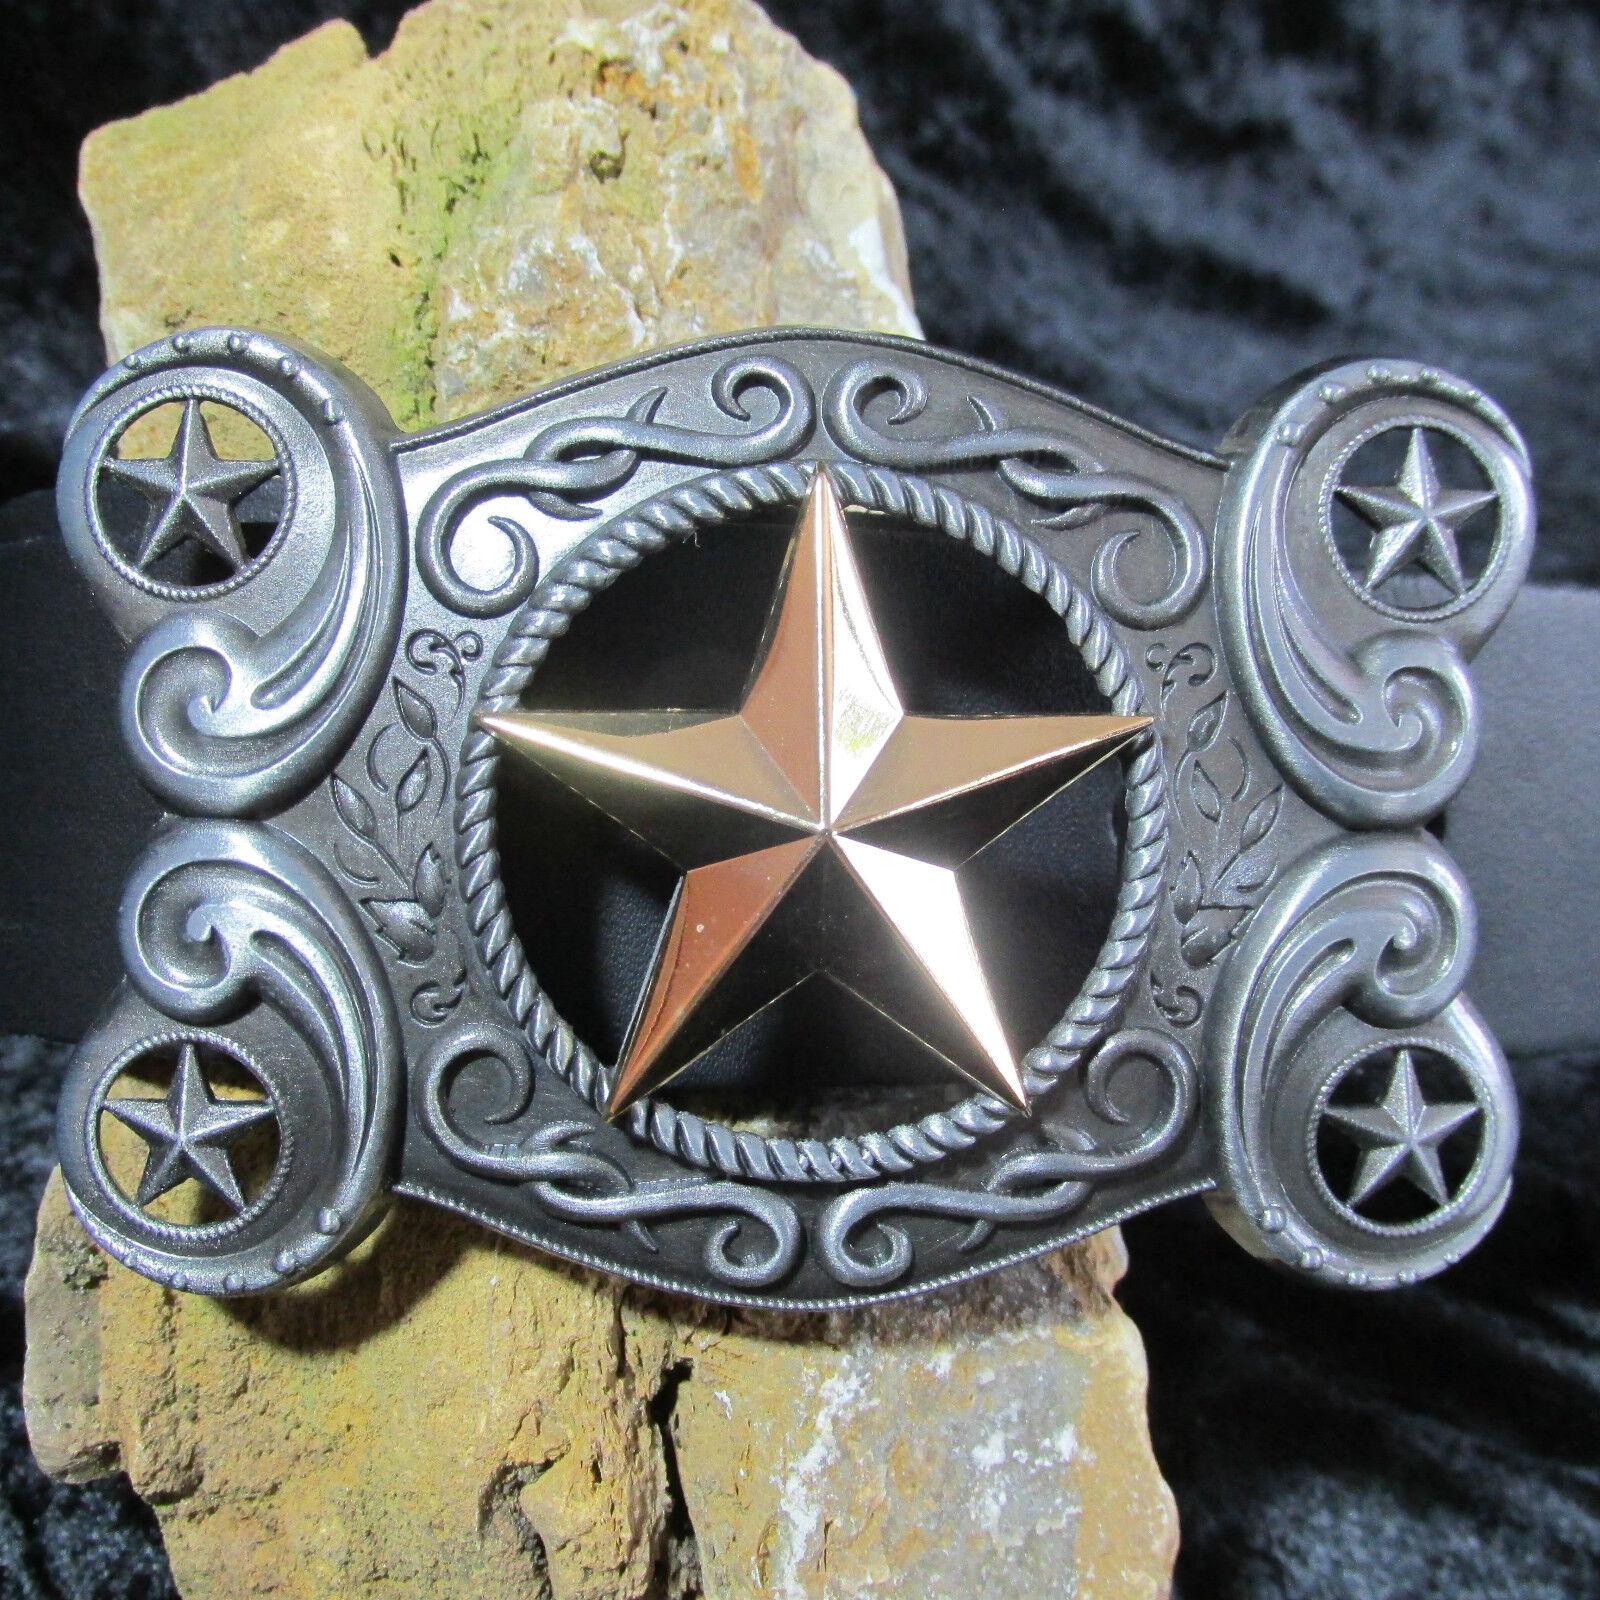 # 0230 Belt Buckle, Buckle, Texas Star, five stars, 5 Stars, USA, Texas,